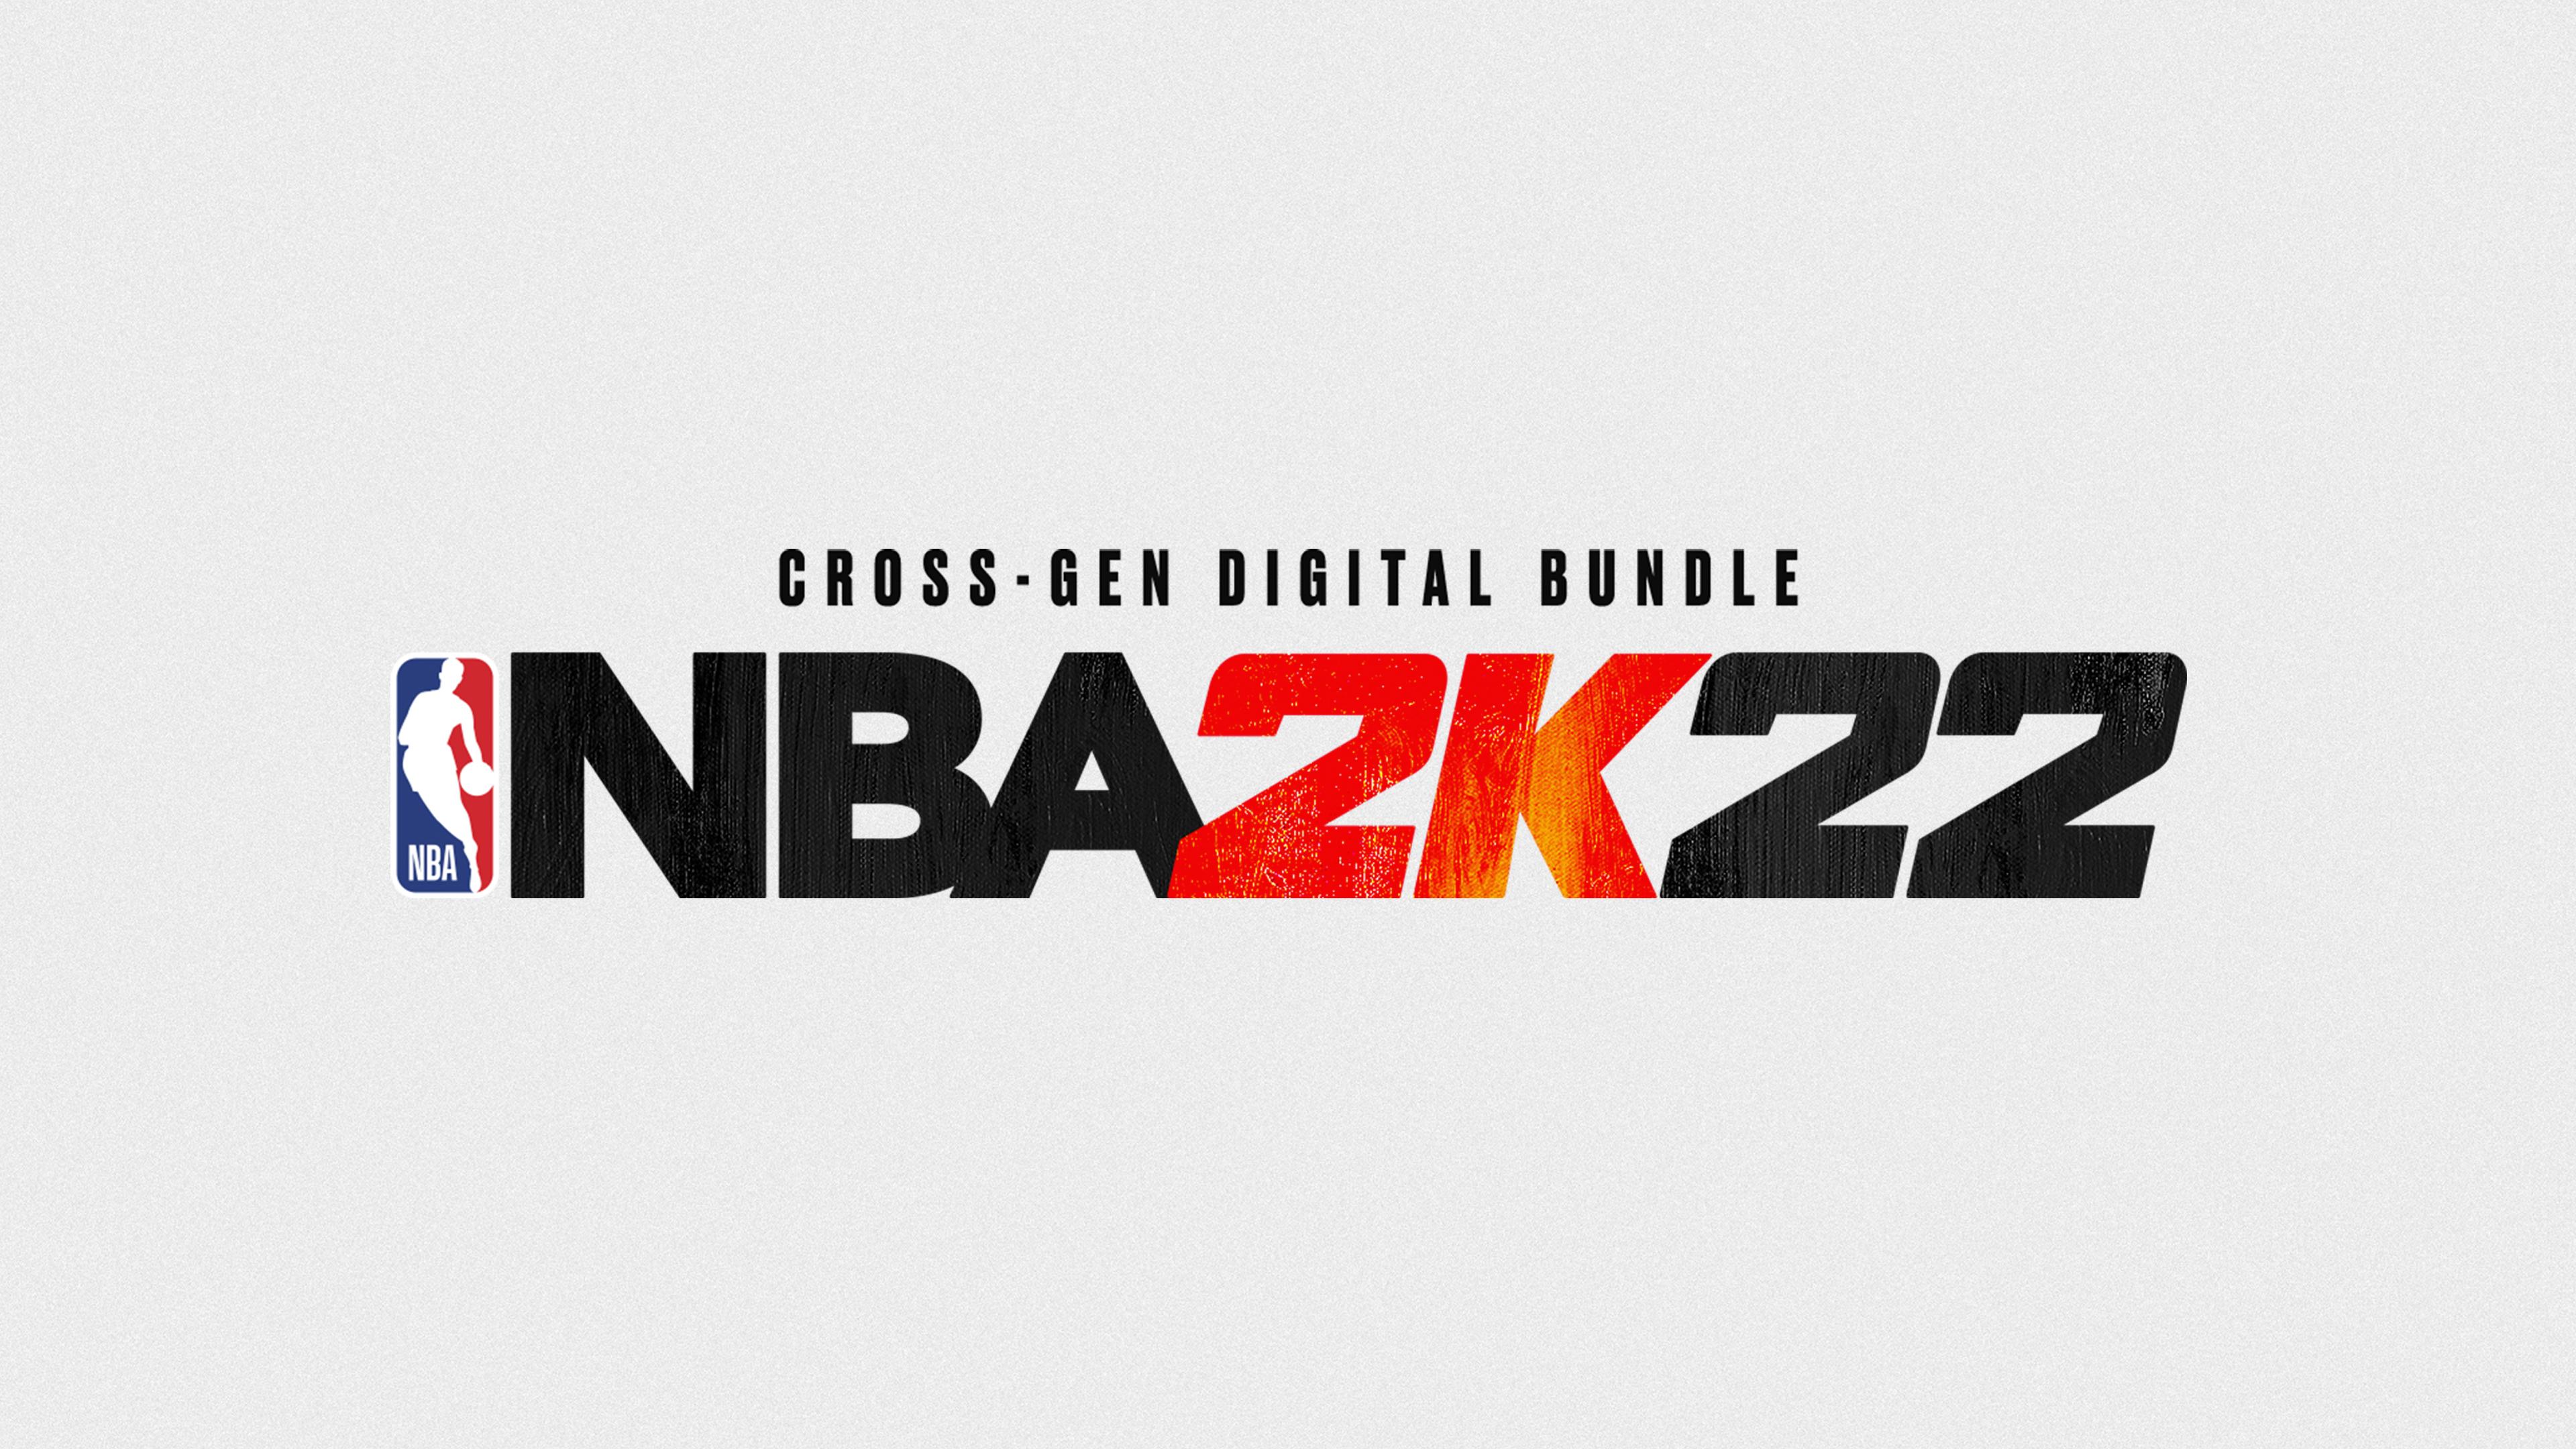 Скриншот №2 к Предзаказ набора NBA 2K22 Cross-Gen Digital Bundle для PS4 and PS5